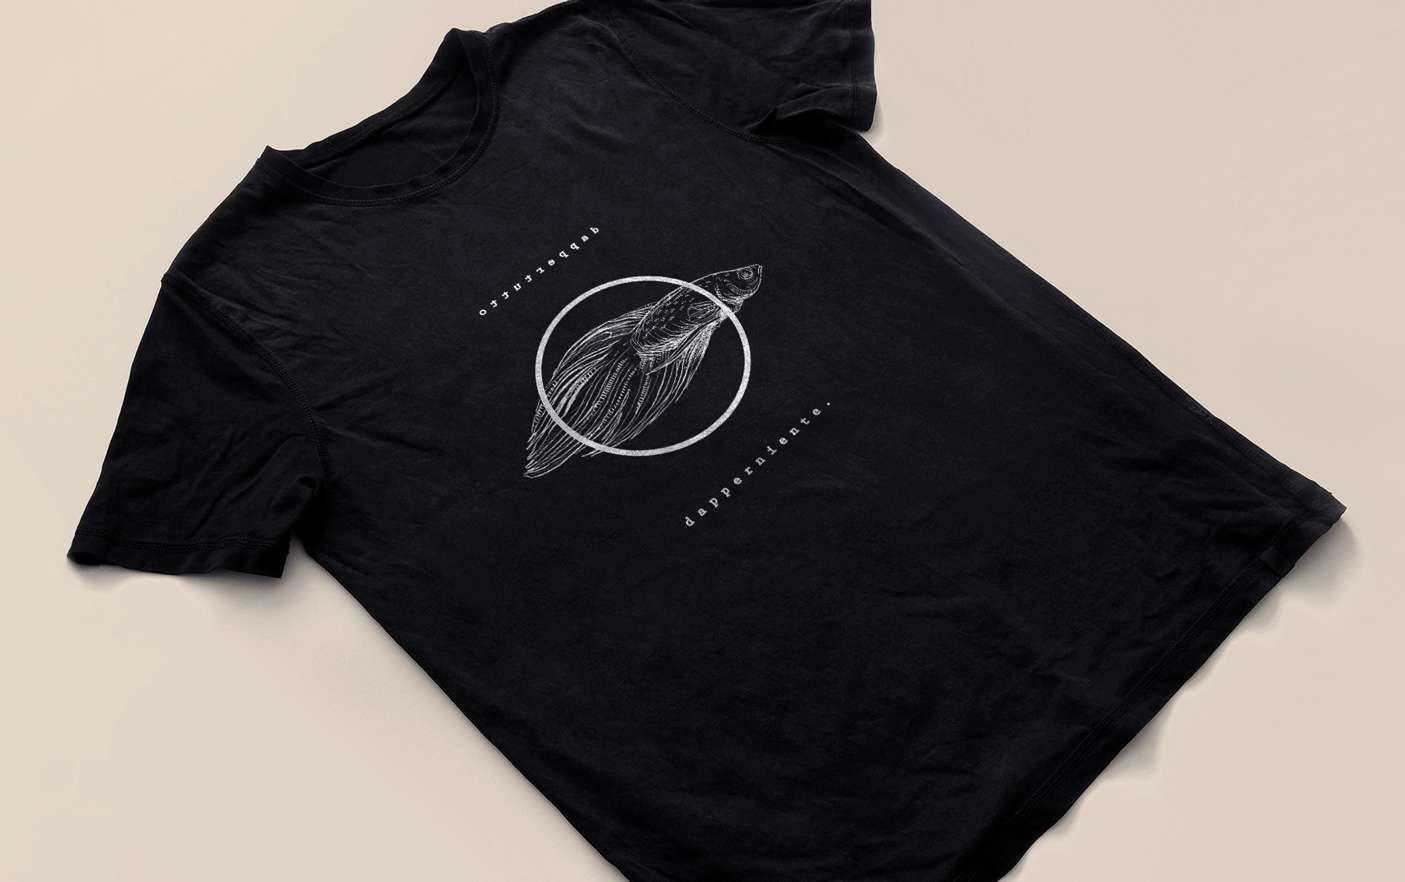 Dapperniente Tshirt - EXRCM